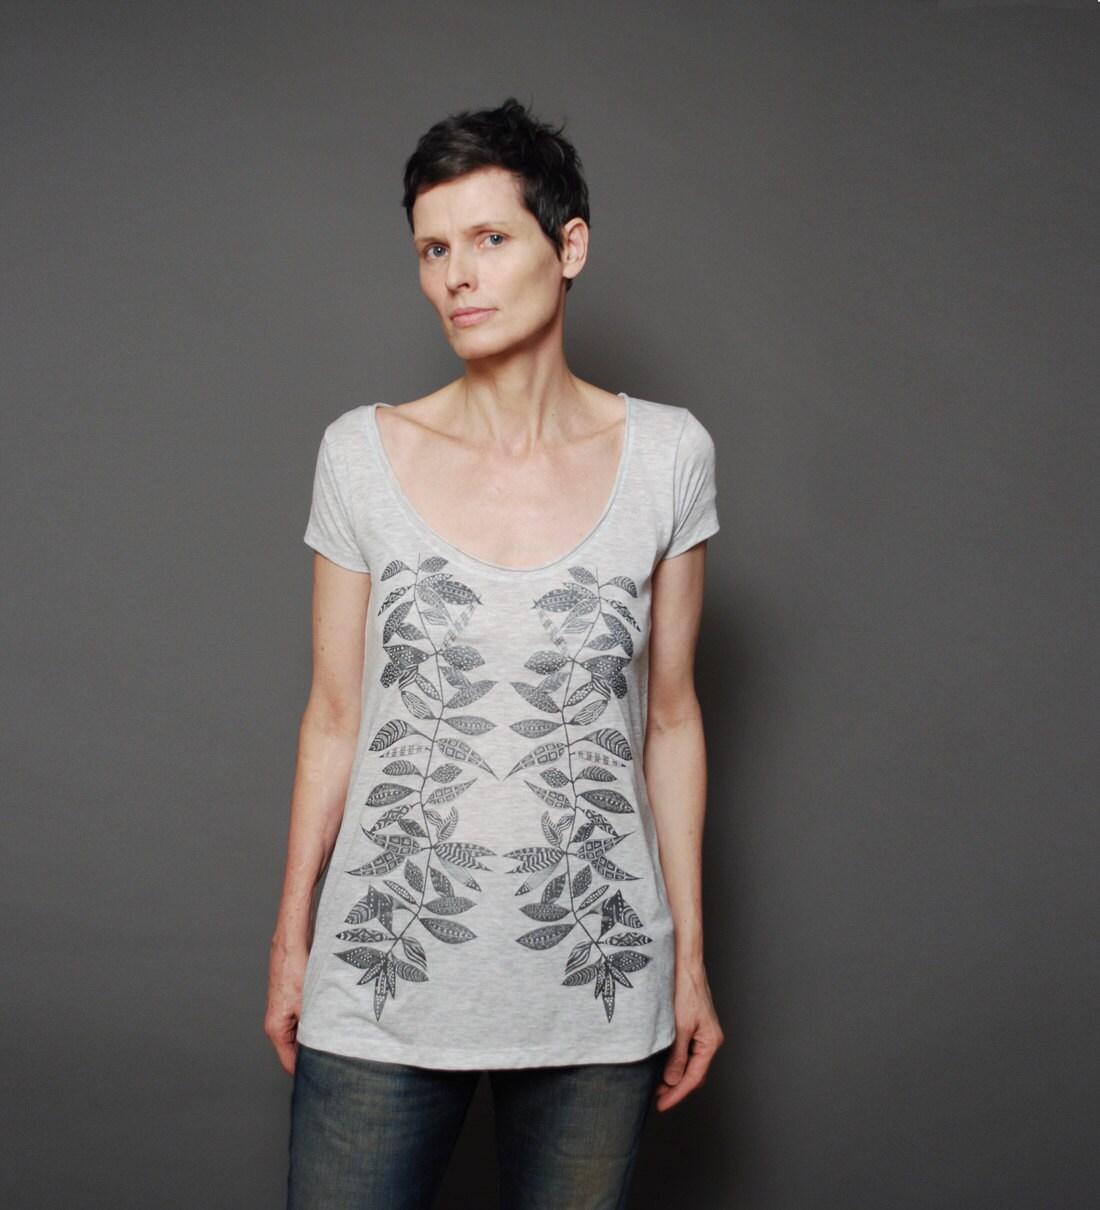 Womens Deep Scoop T shirt - Twig Vine Spring Fashion Loose fit T-Shirt - Alternative Apparel T shirt - sealmaiden